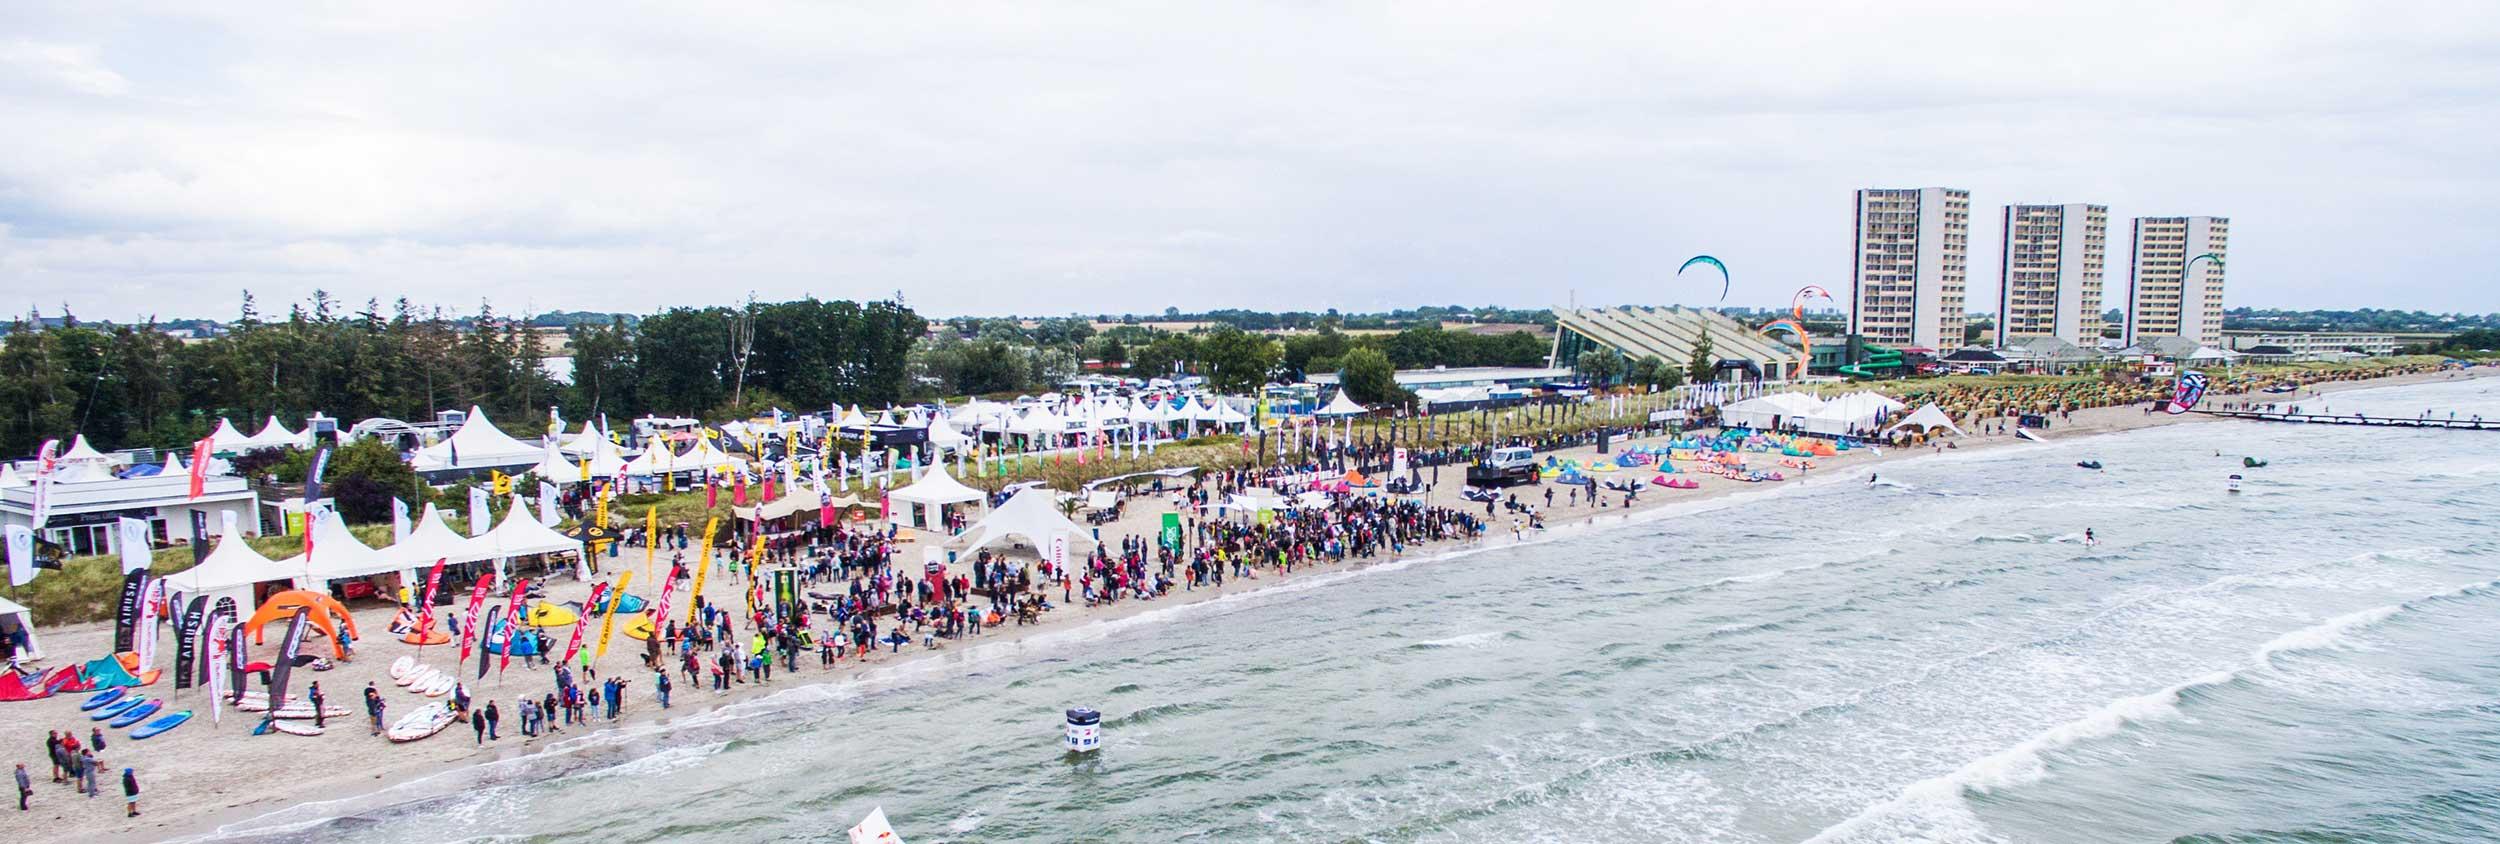 Fehmarn event - GKA Germany Kitesurf World Cup - Air Games